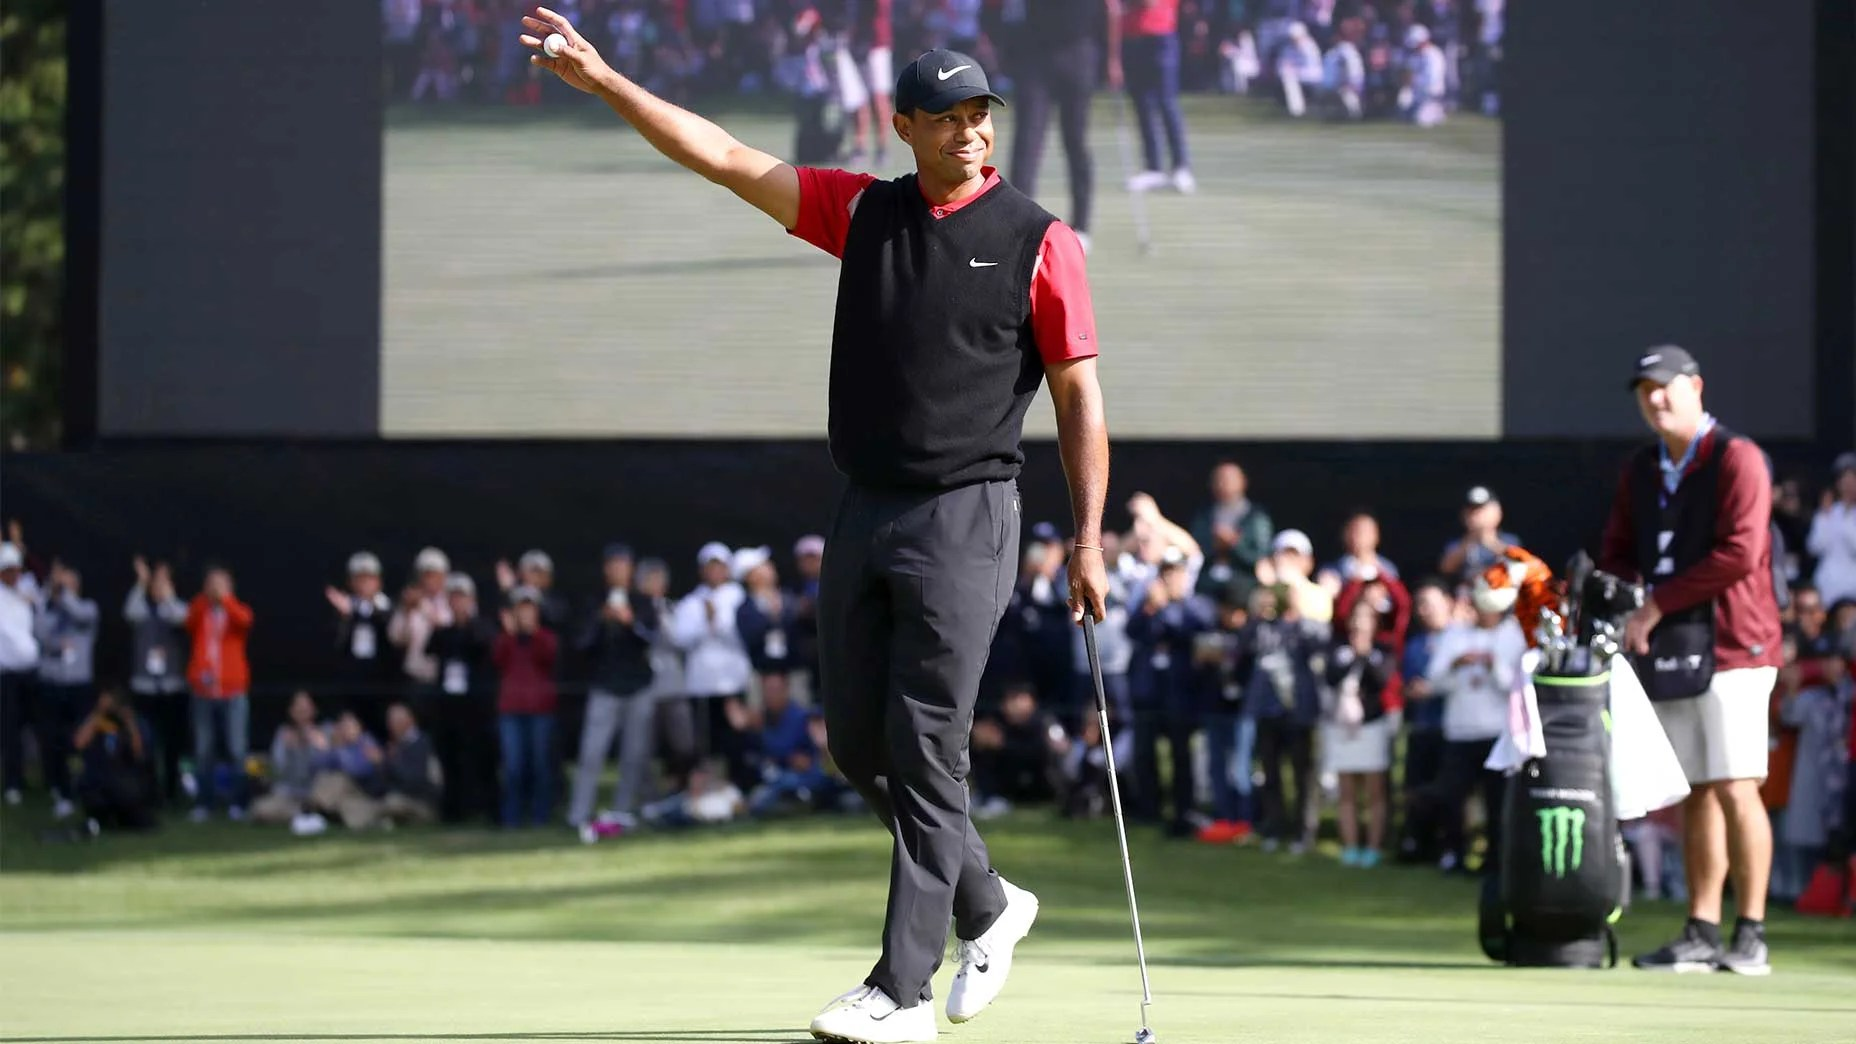 Tiger Woods wins the Zozo Championship.